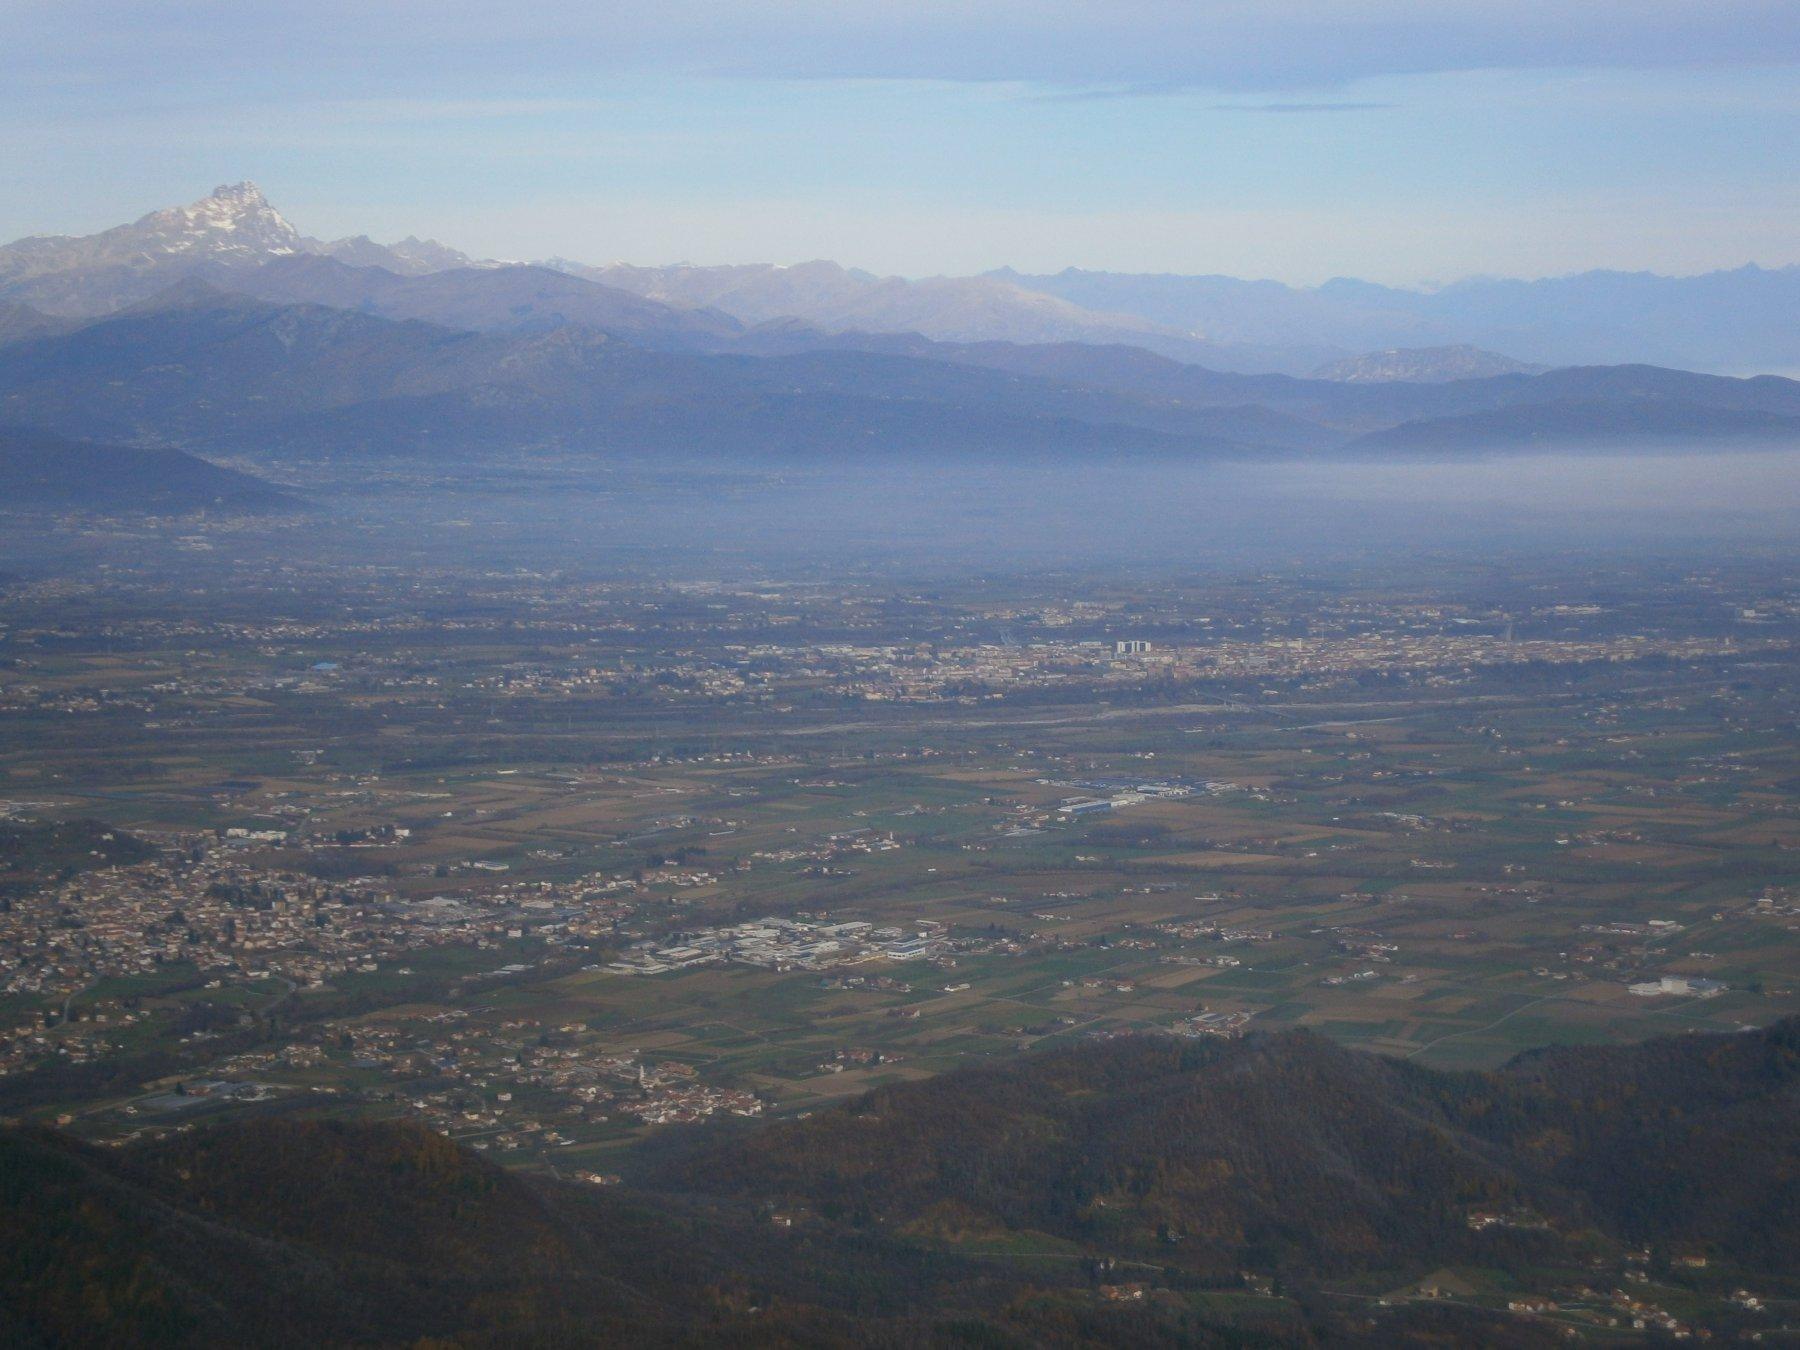 Boves e Cuneo